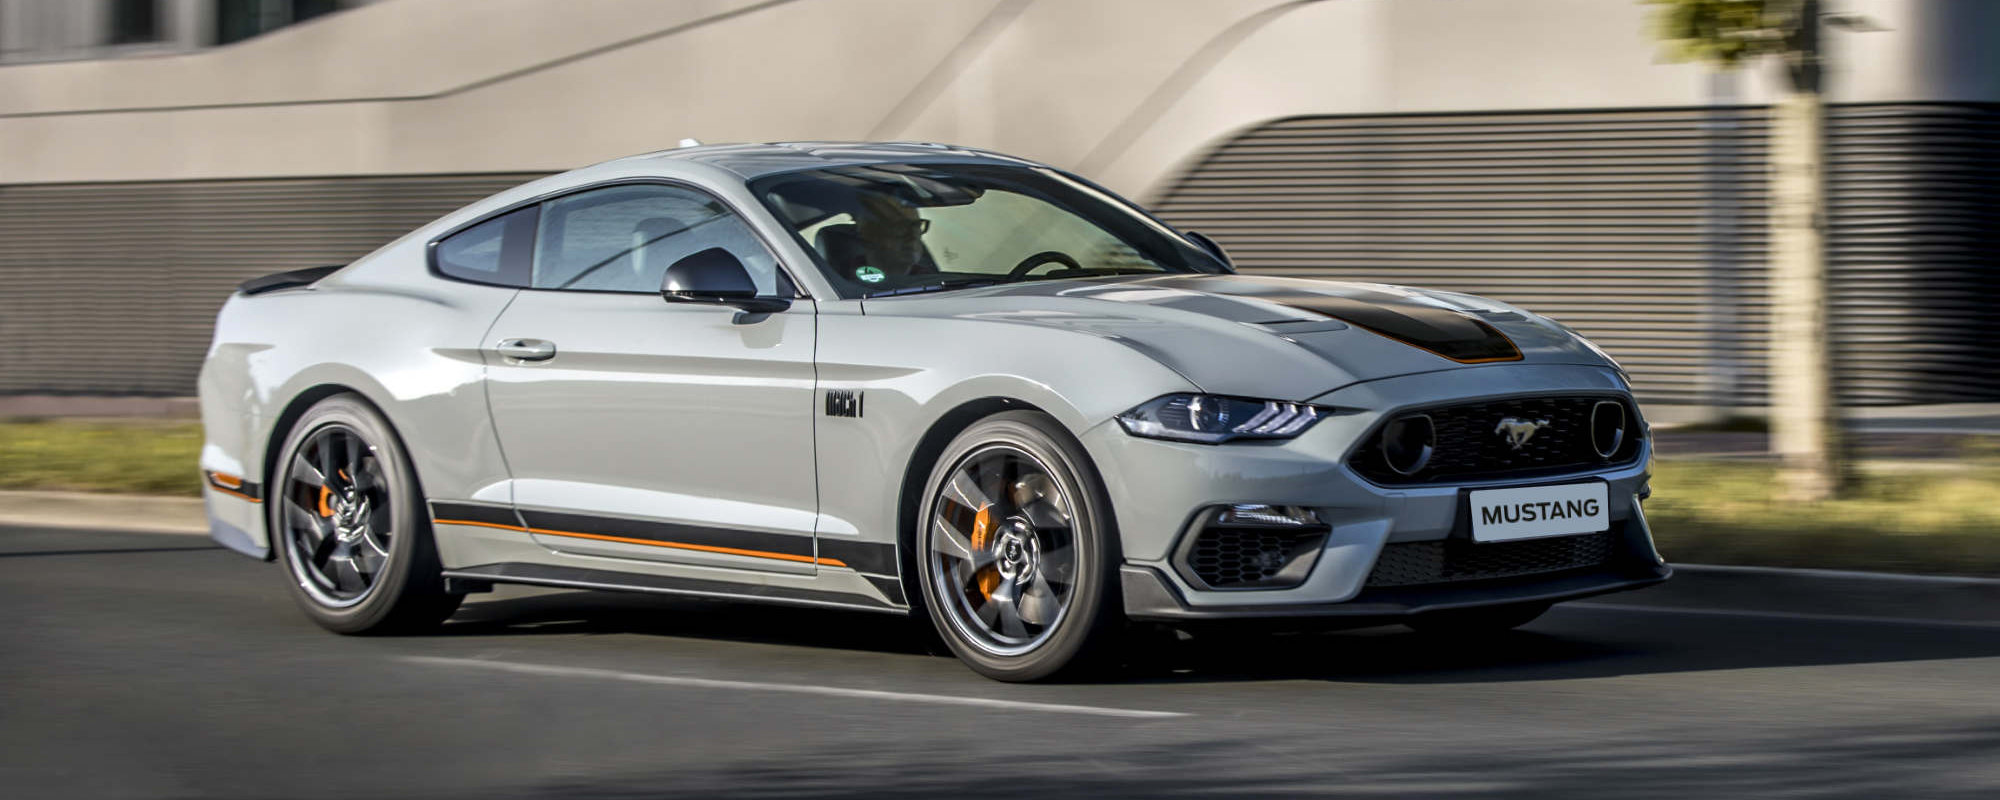 Mustang Mach 1 - Bergerkrysset Mysen